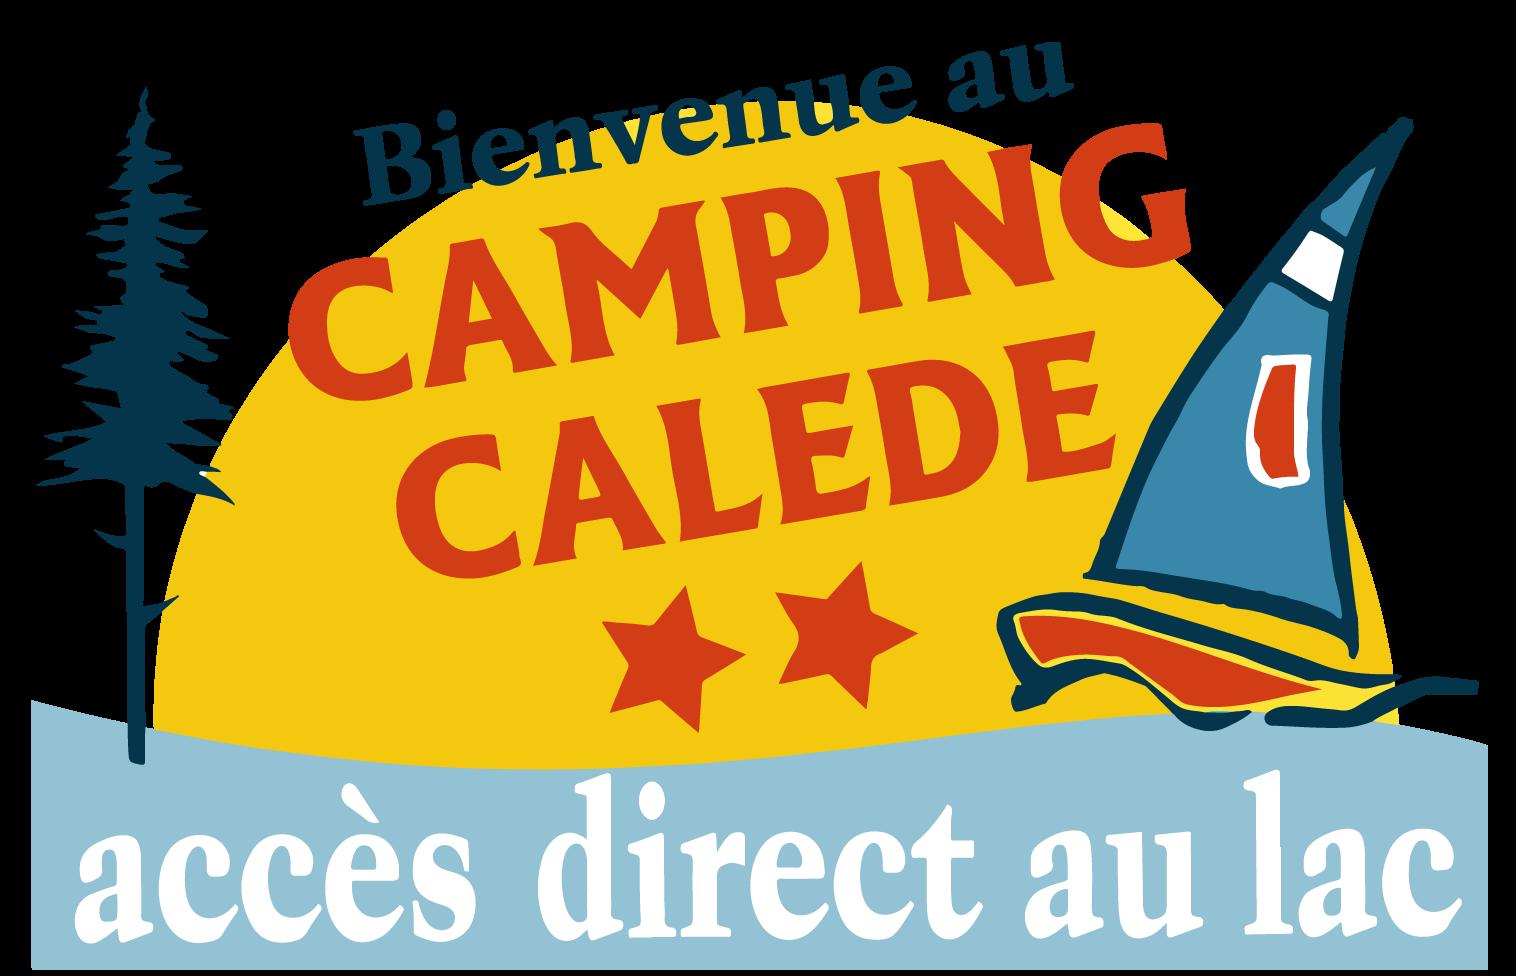 camping calede